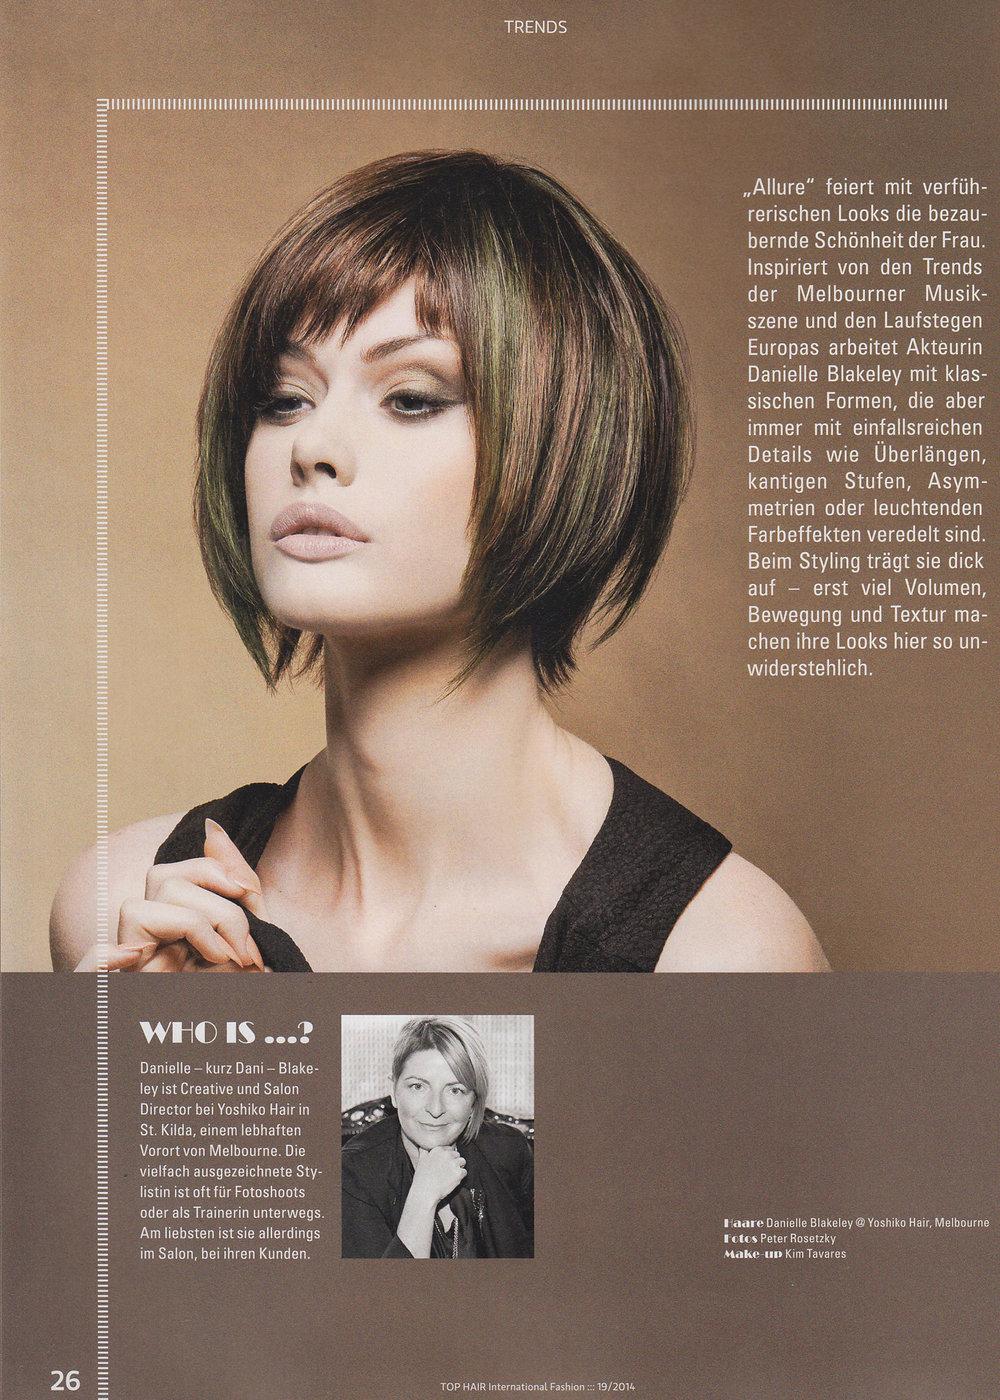 yoshikohair_stkilda_melbourne_hairdresser_hairsalon_tophair15_3